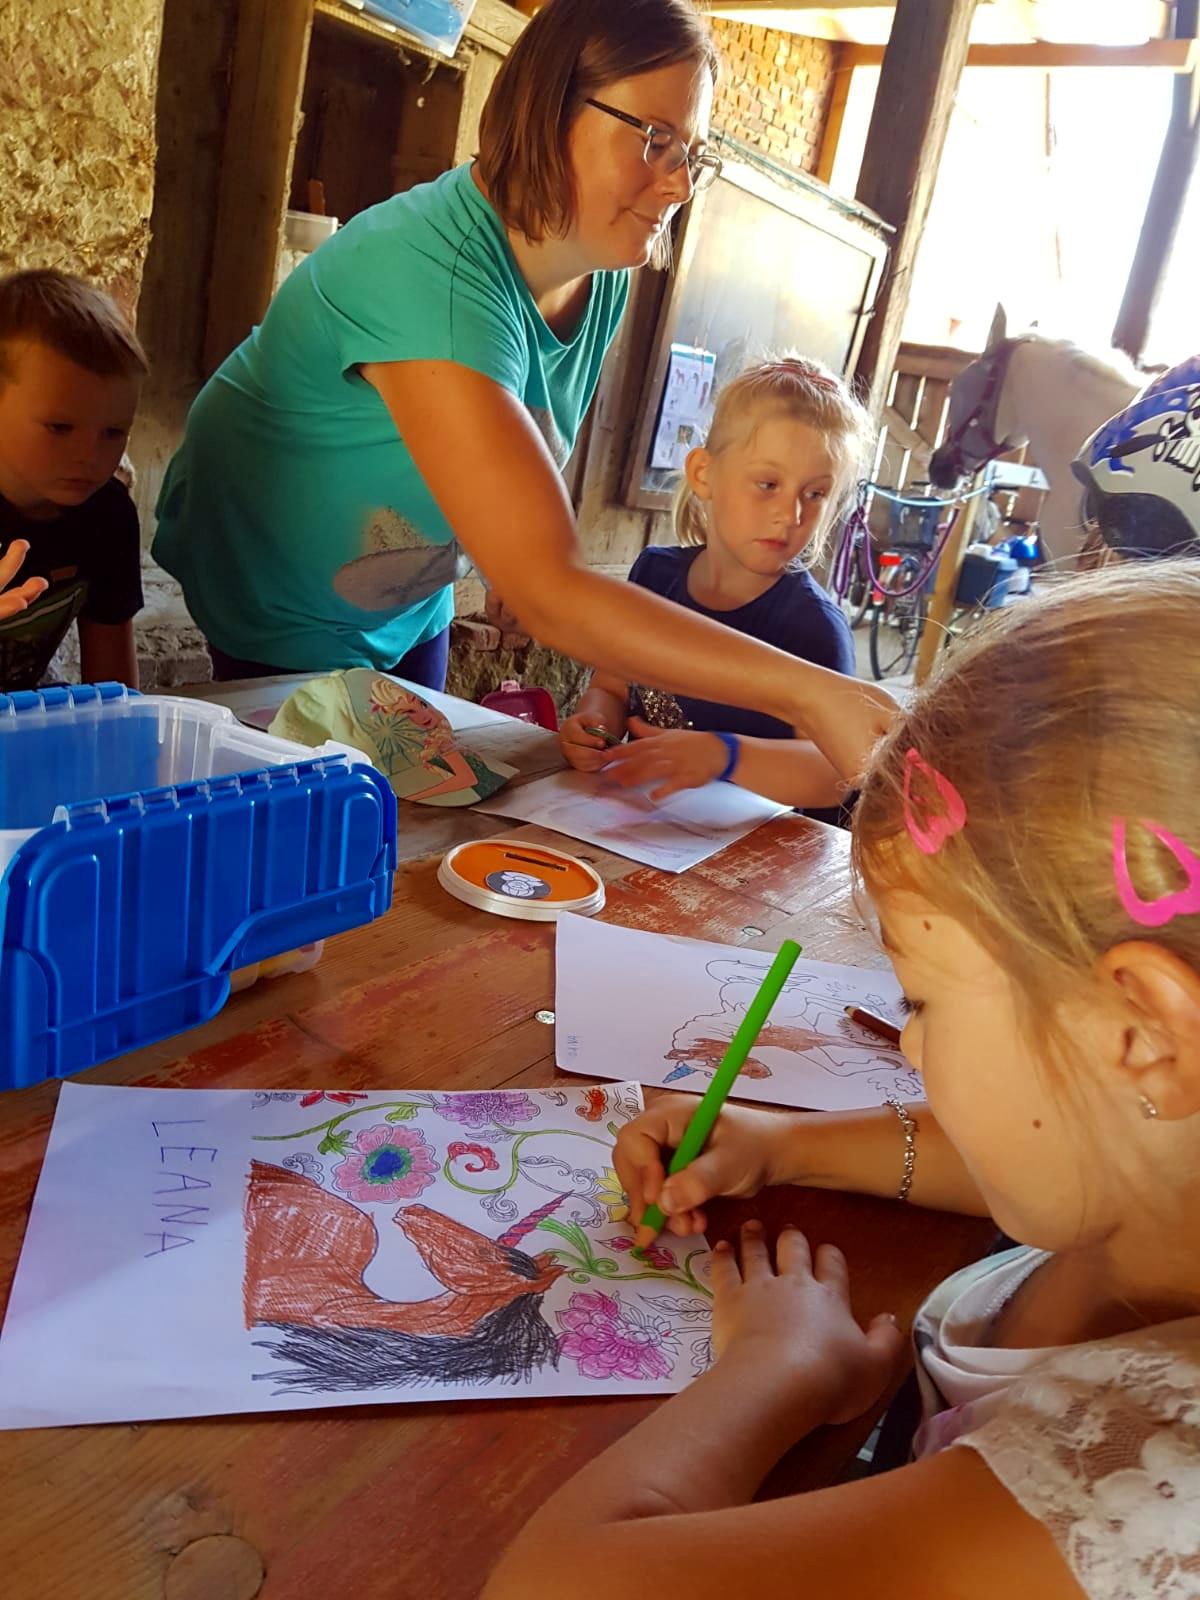 Pferdeerlebnistage Kessy's Pferdeclub - Pferde für unsere Kinder e.V. (II)